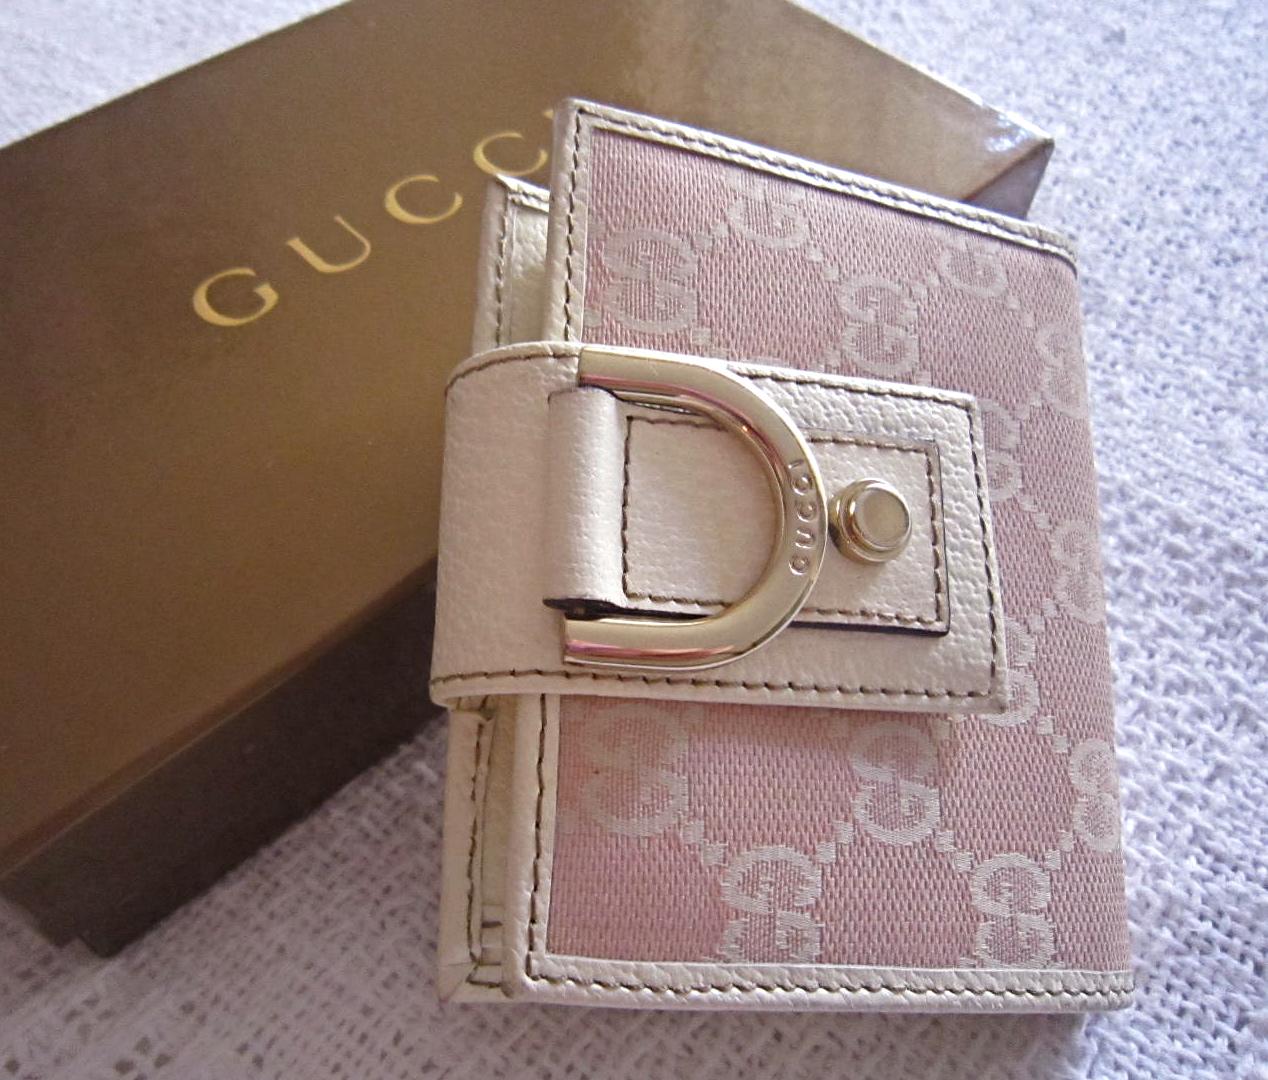 d6899d03390a Gucci GG Pink Abbey D-ring Wallet - Luxurylana Boutique